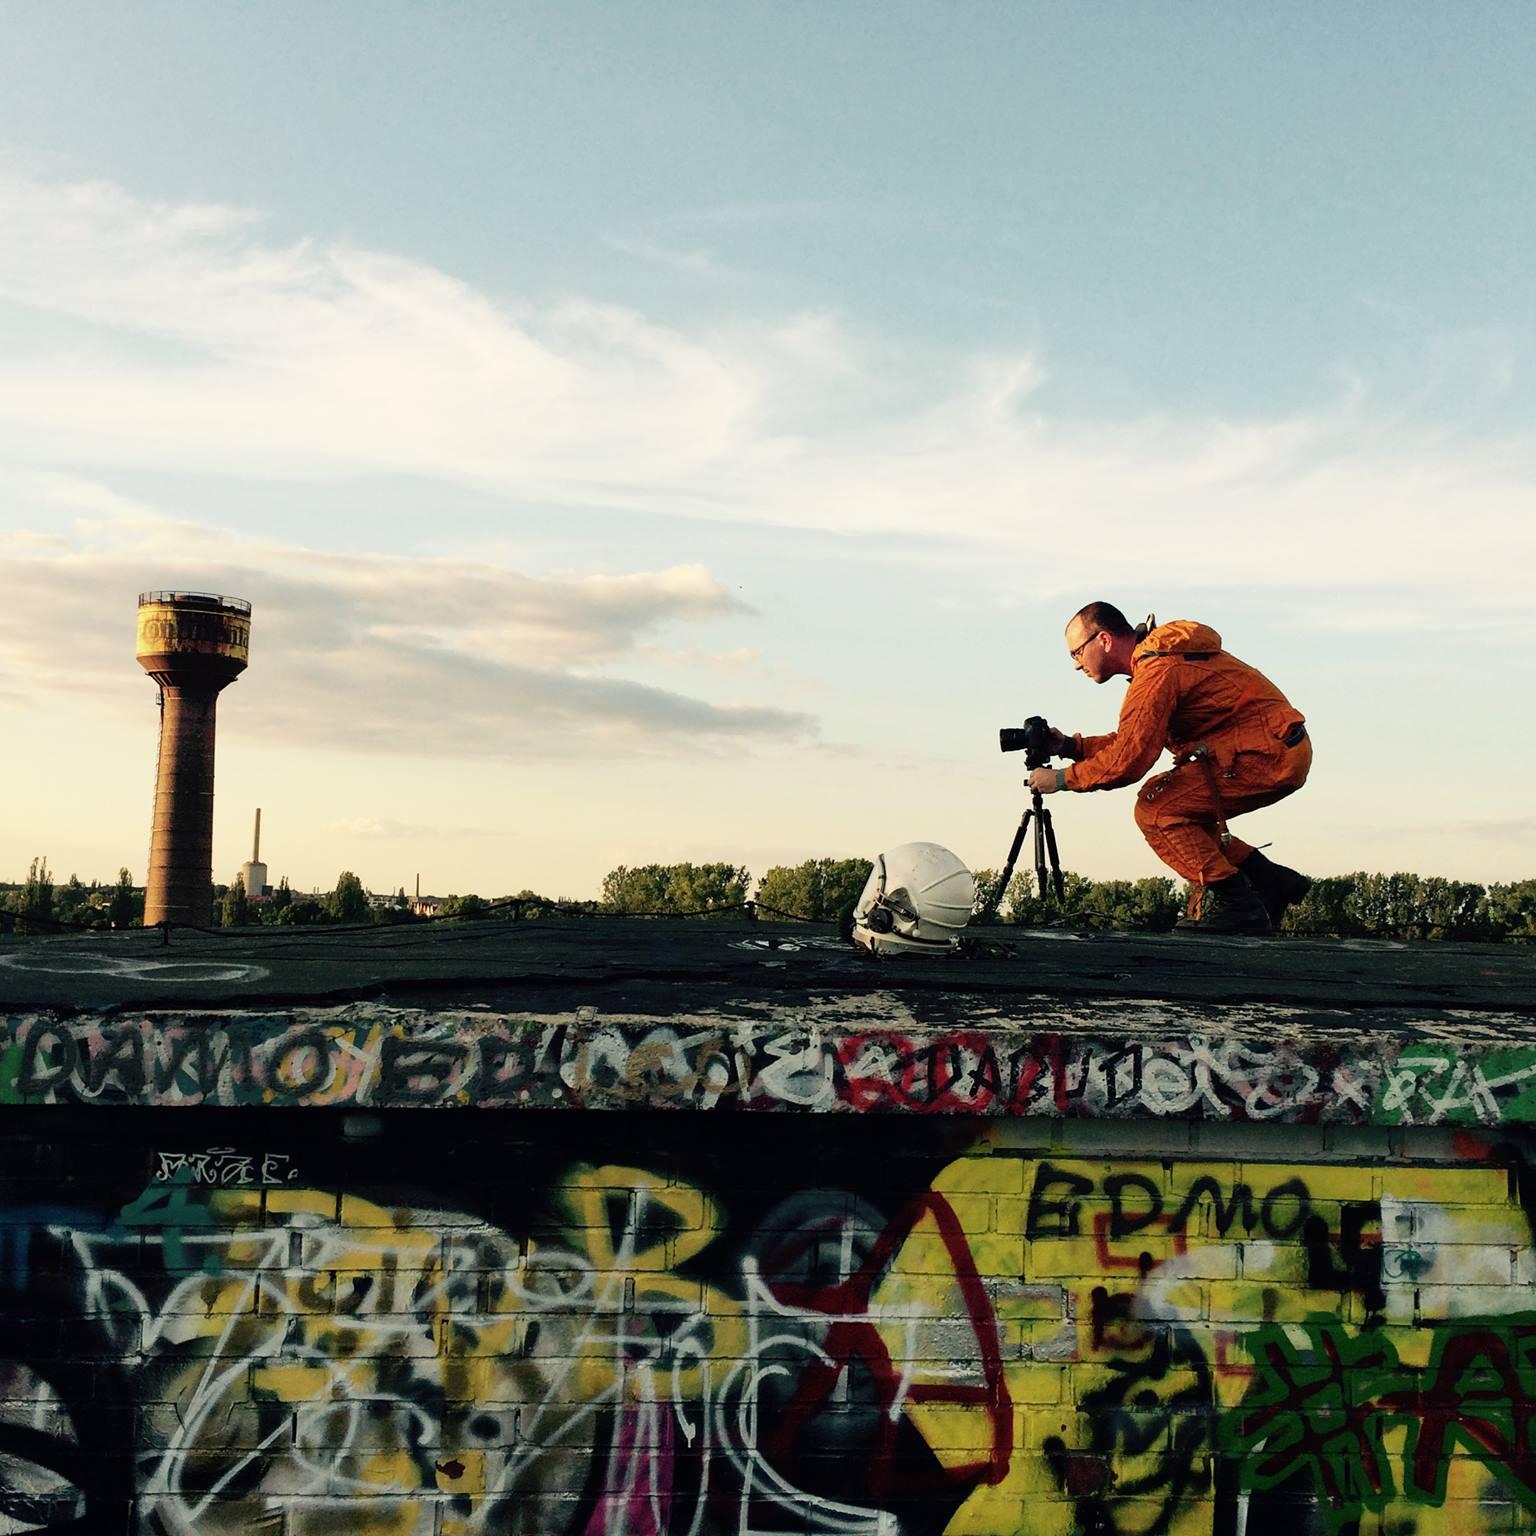 Continental Tire Factory - Hanover - Germany abandoned astronaut photoshoot